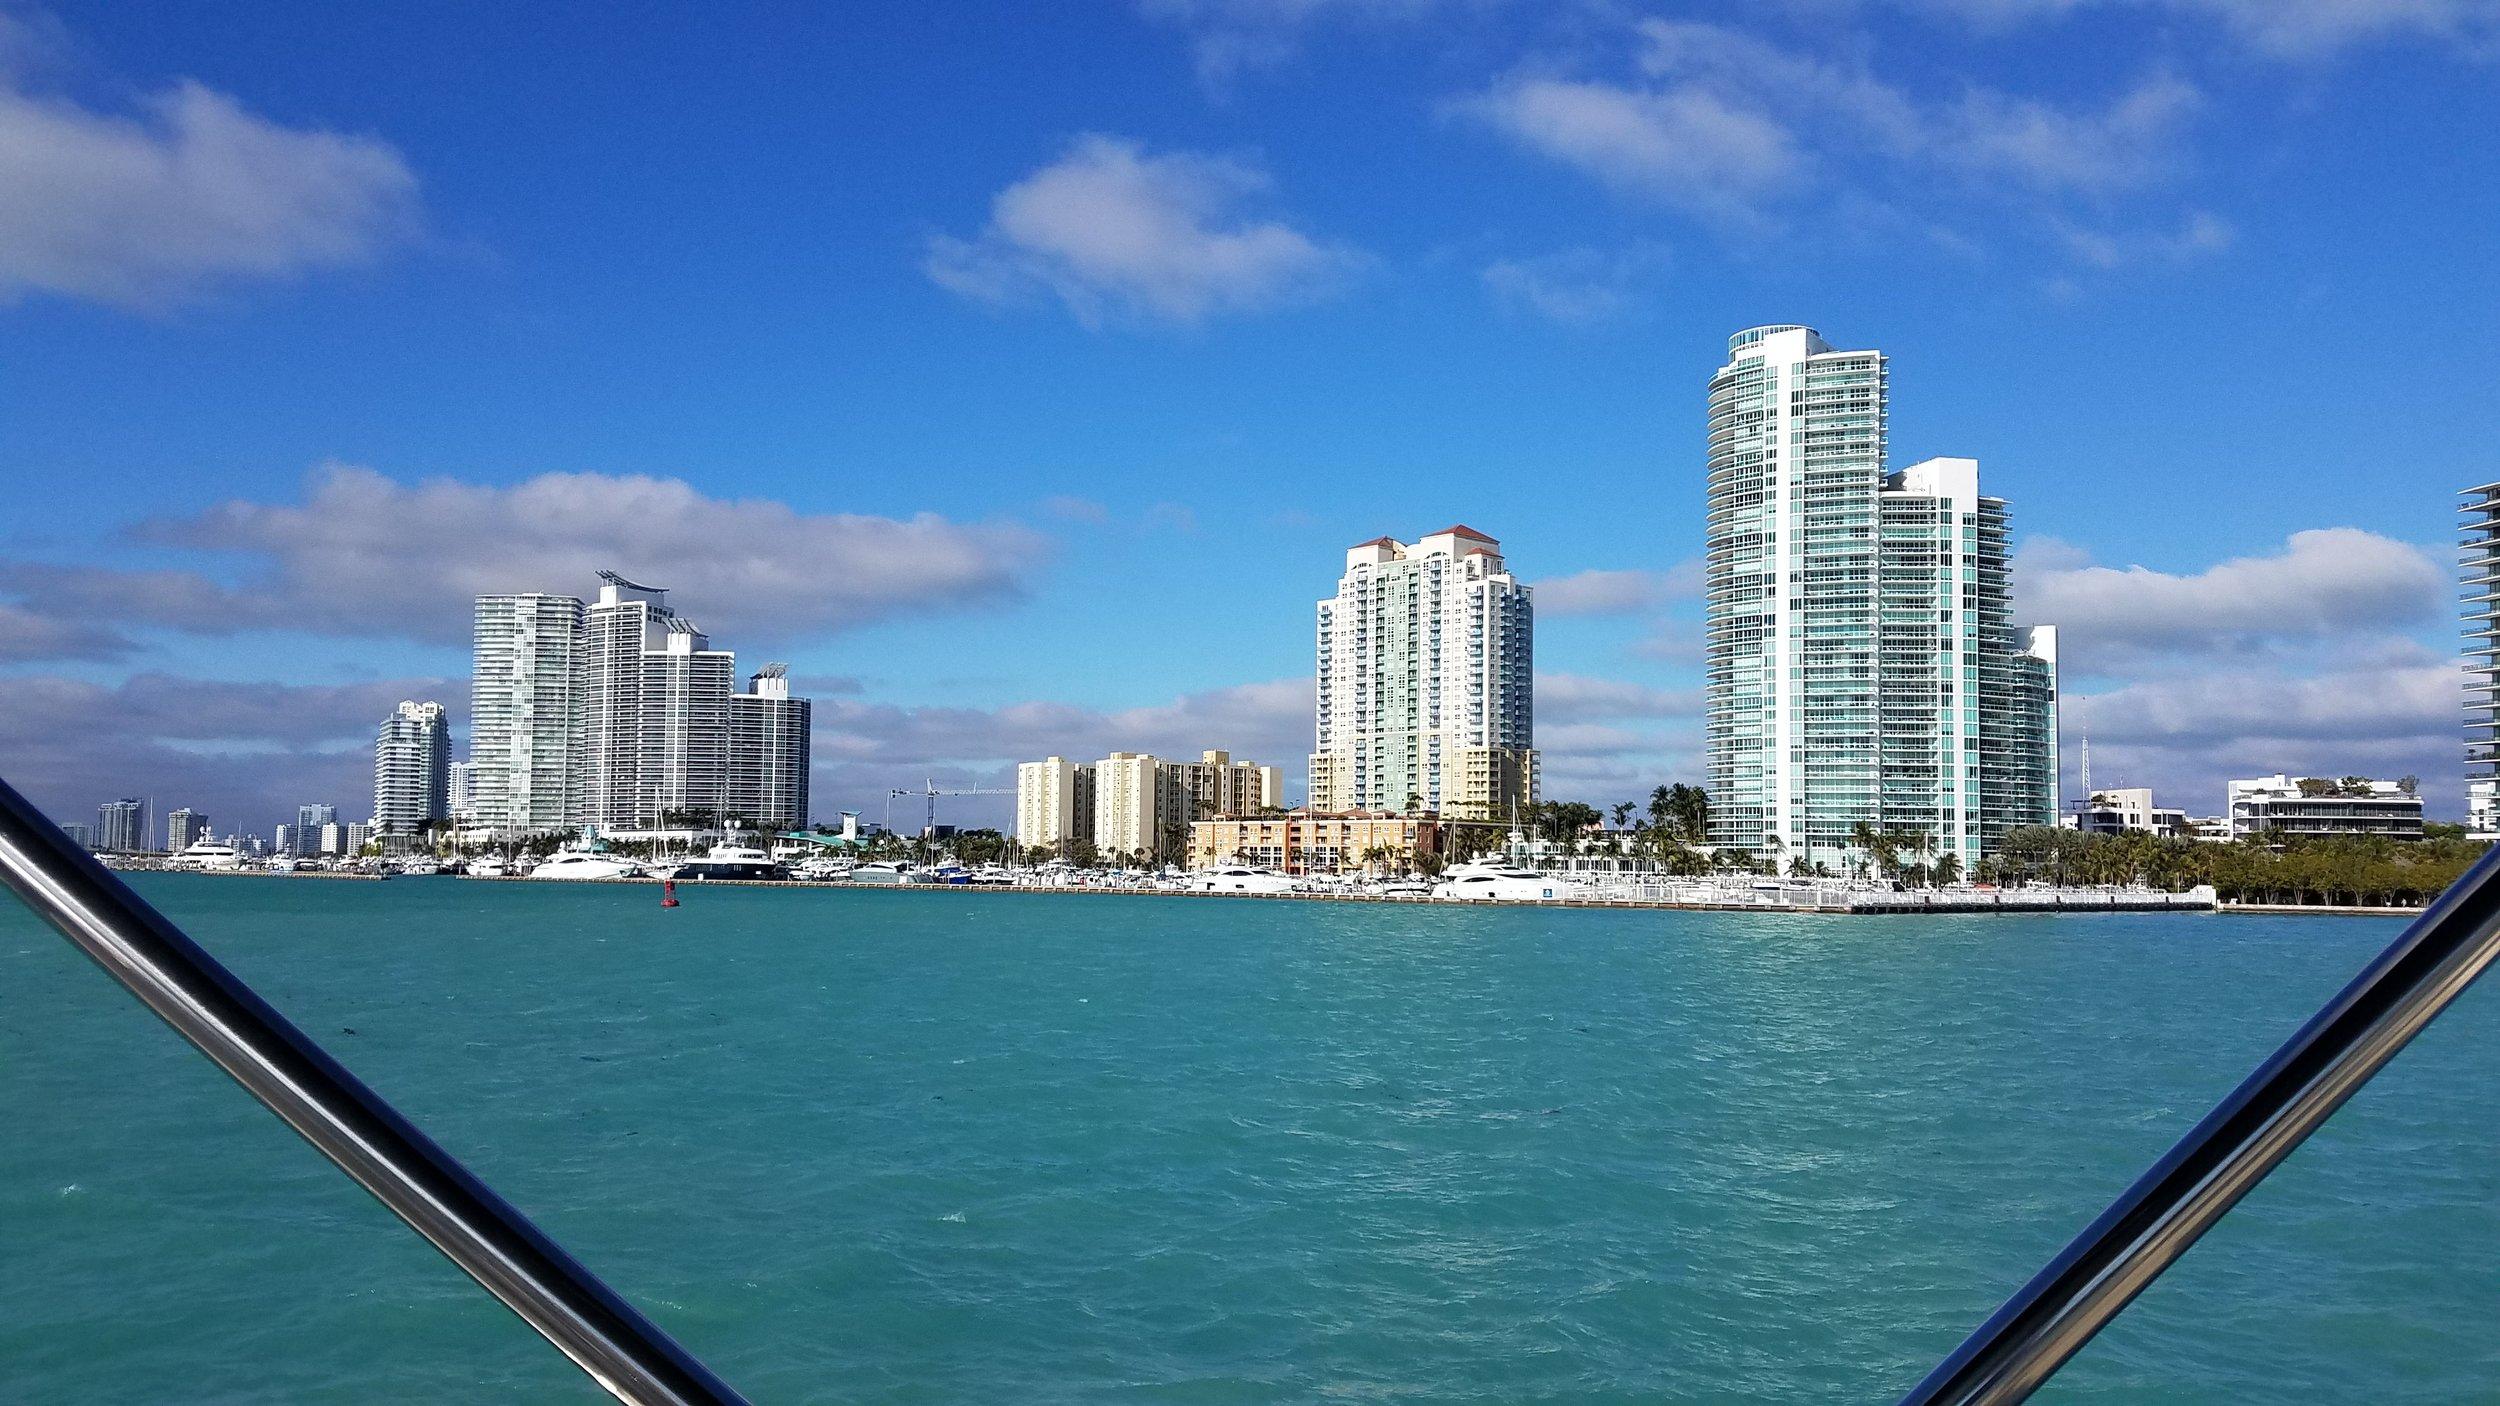 Miami city front